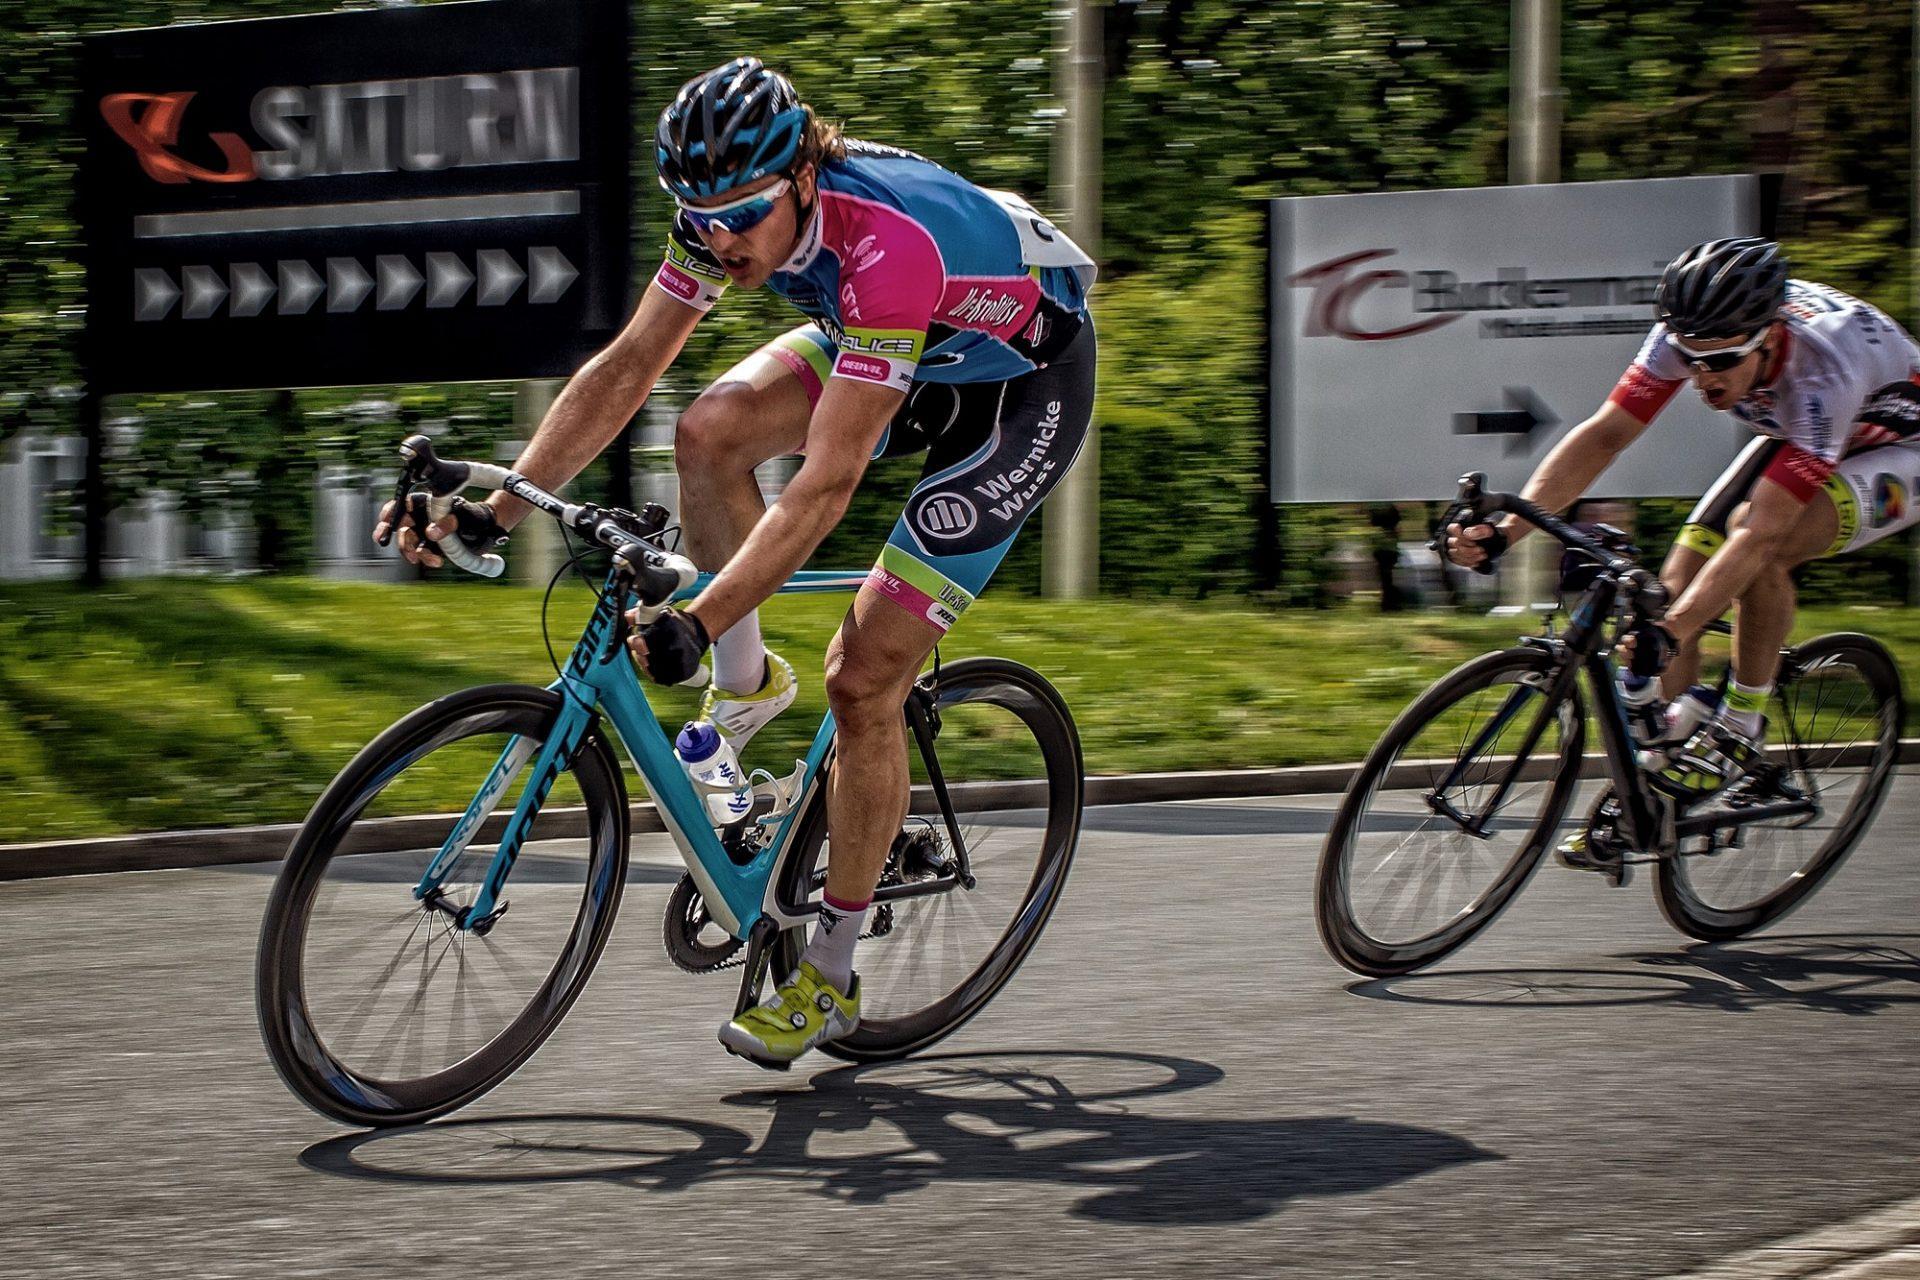 Sportfotografie - Radsport